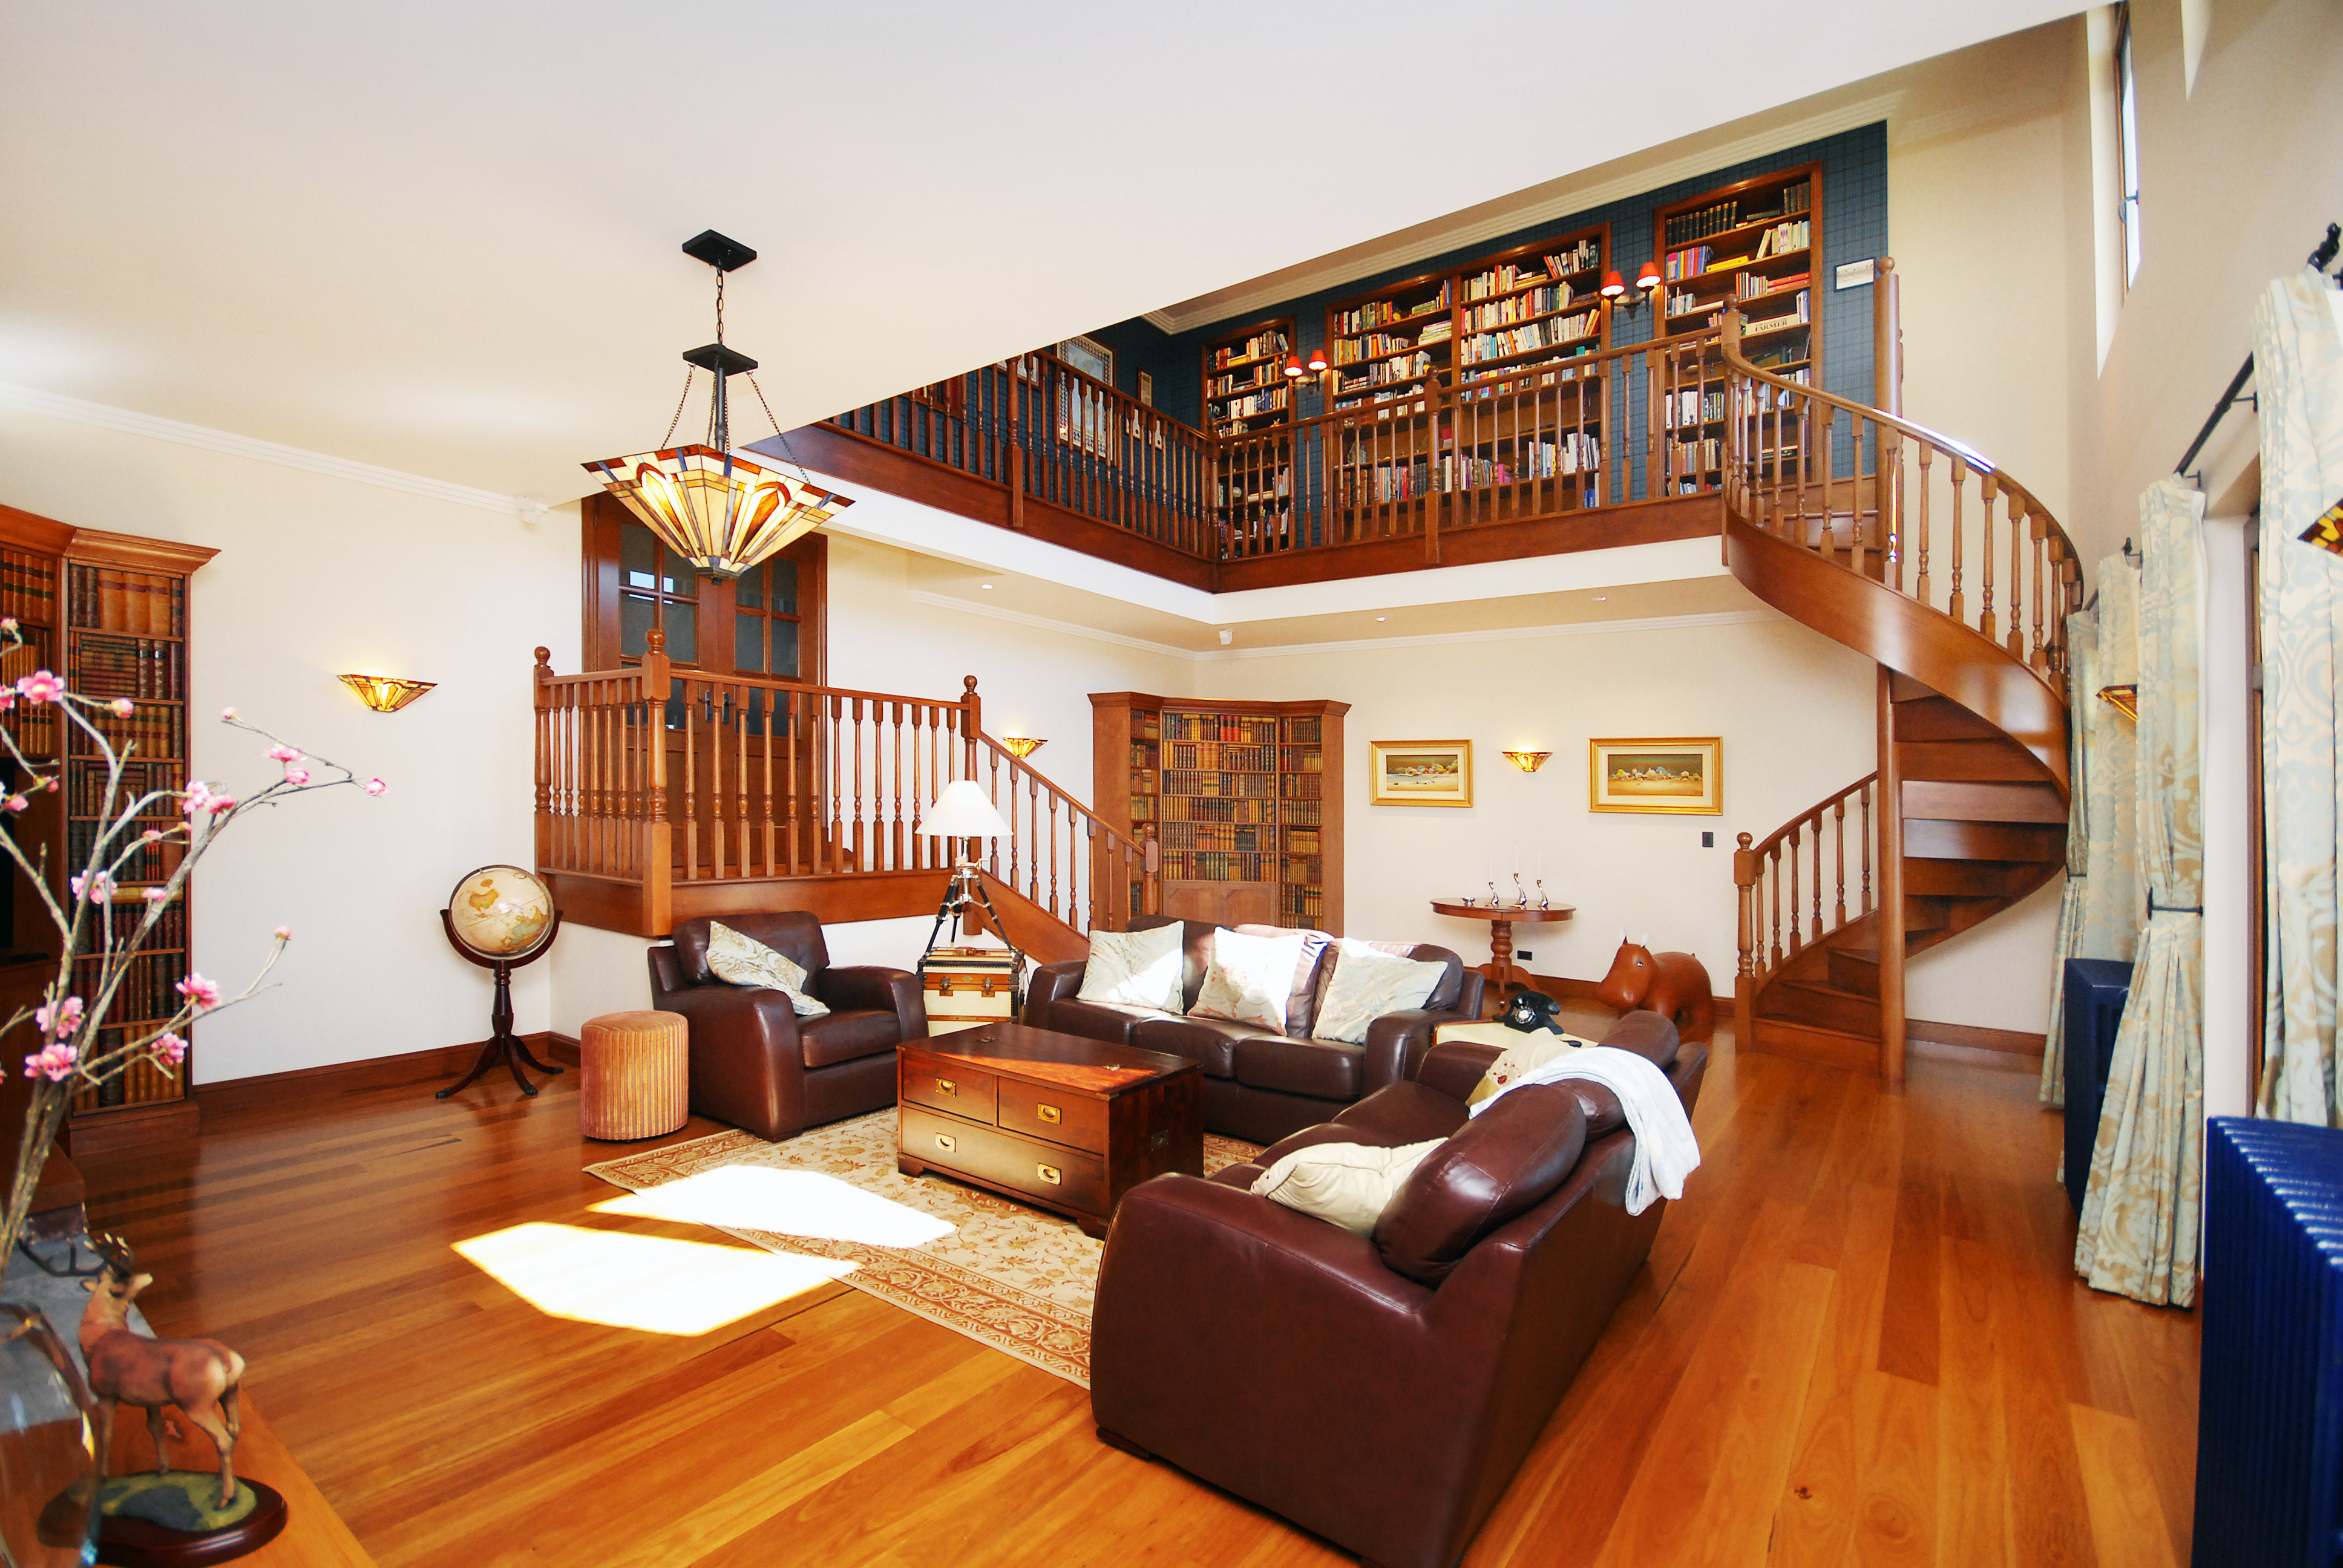 Traditional English Manor